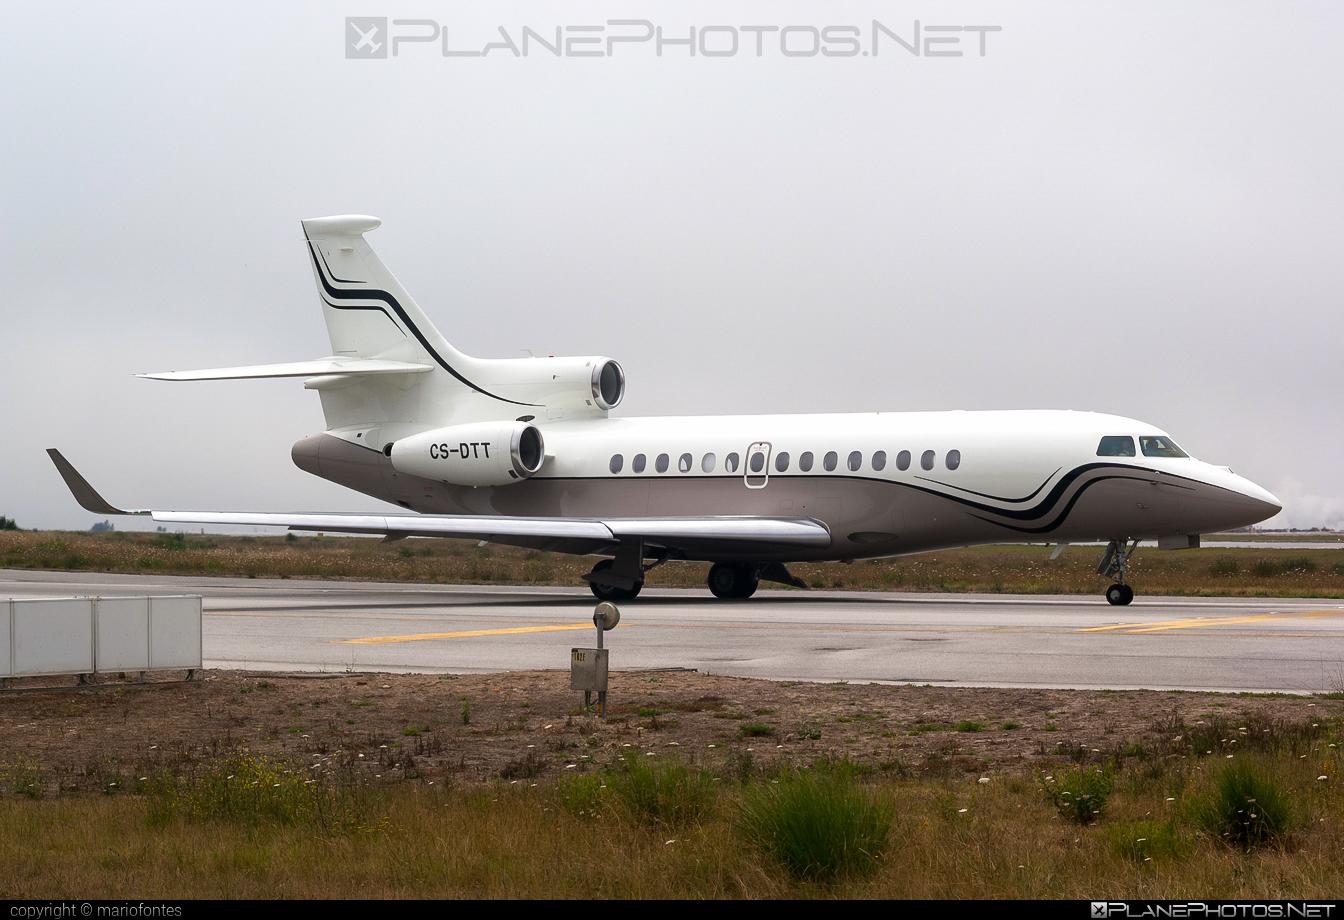 Dassault Falcon 7X - CS-DTT operated by Vinair Aeroserviços S.A. #dassault #dassaultfalcon #dassaultfalcon7x #falcon7x #vinair #vinairaeroservicos